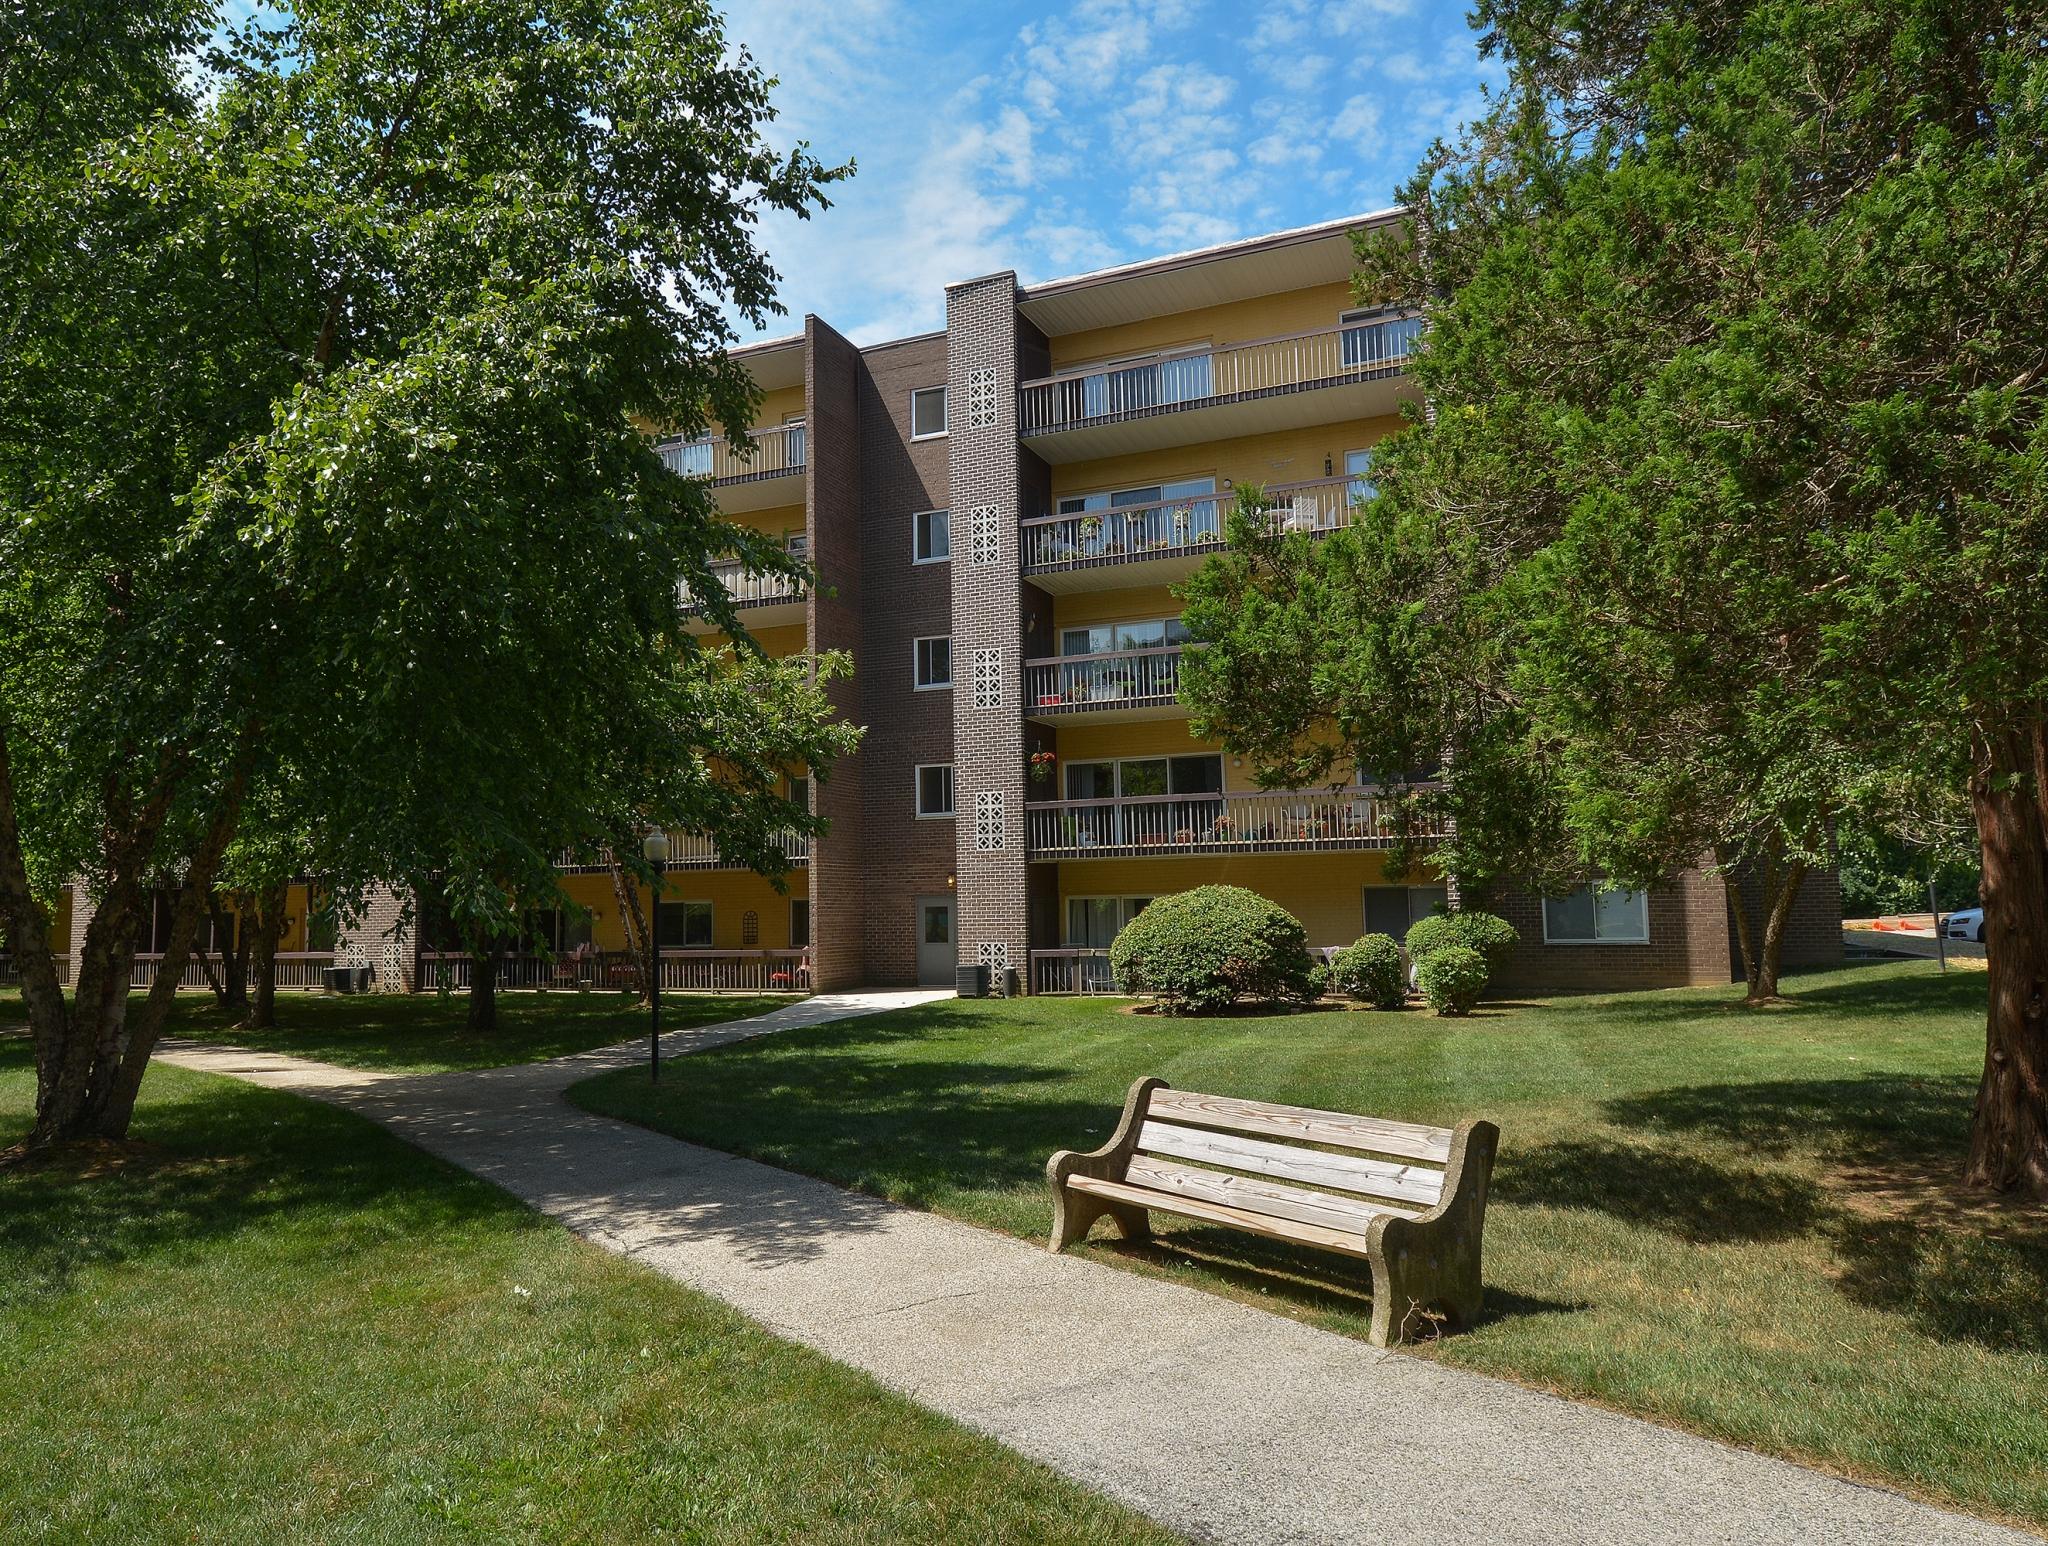 Main Line Berwyn Apartments image 1